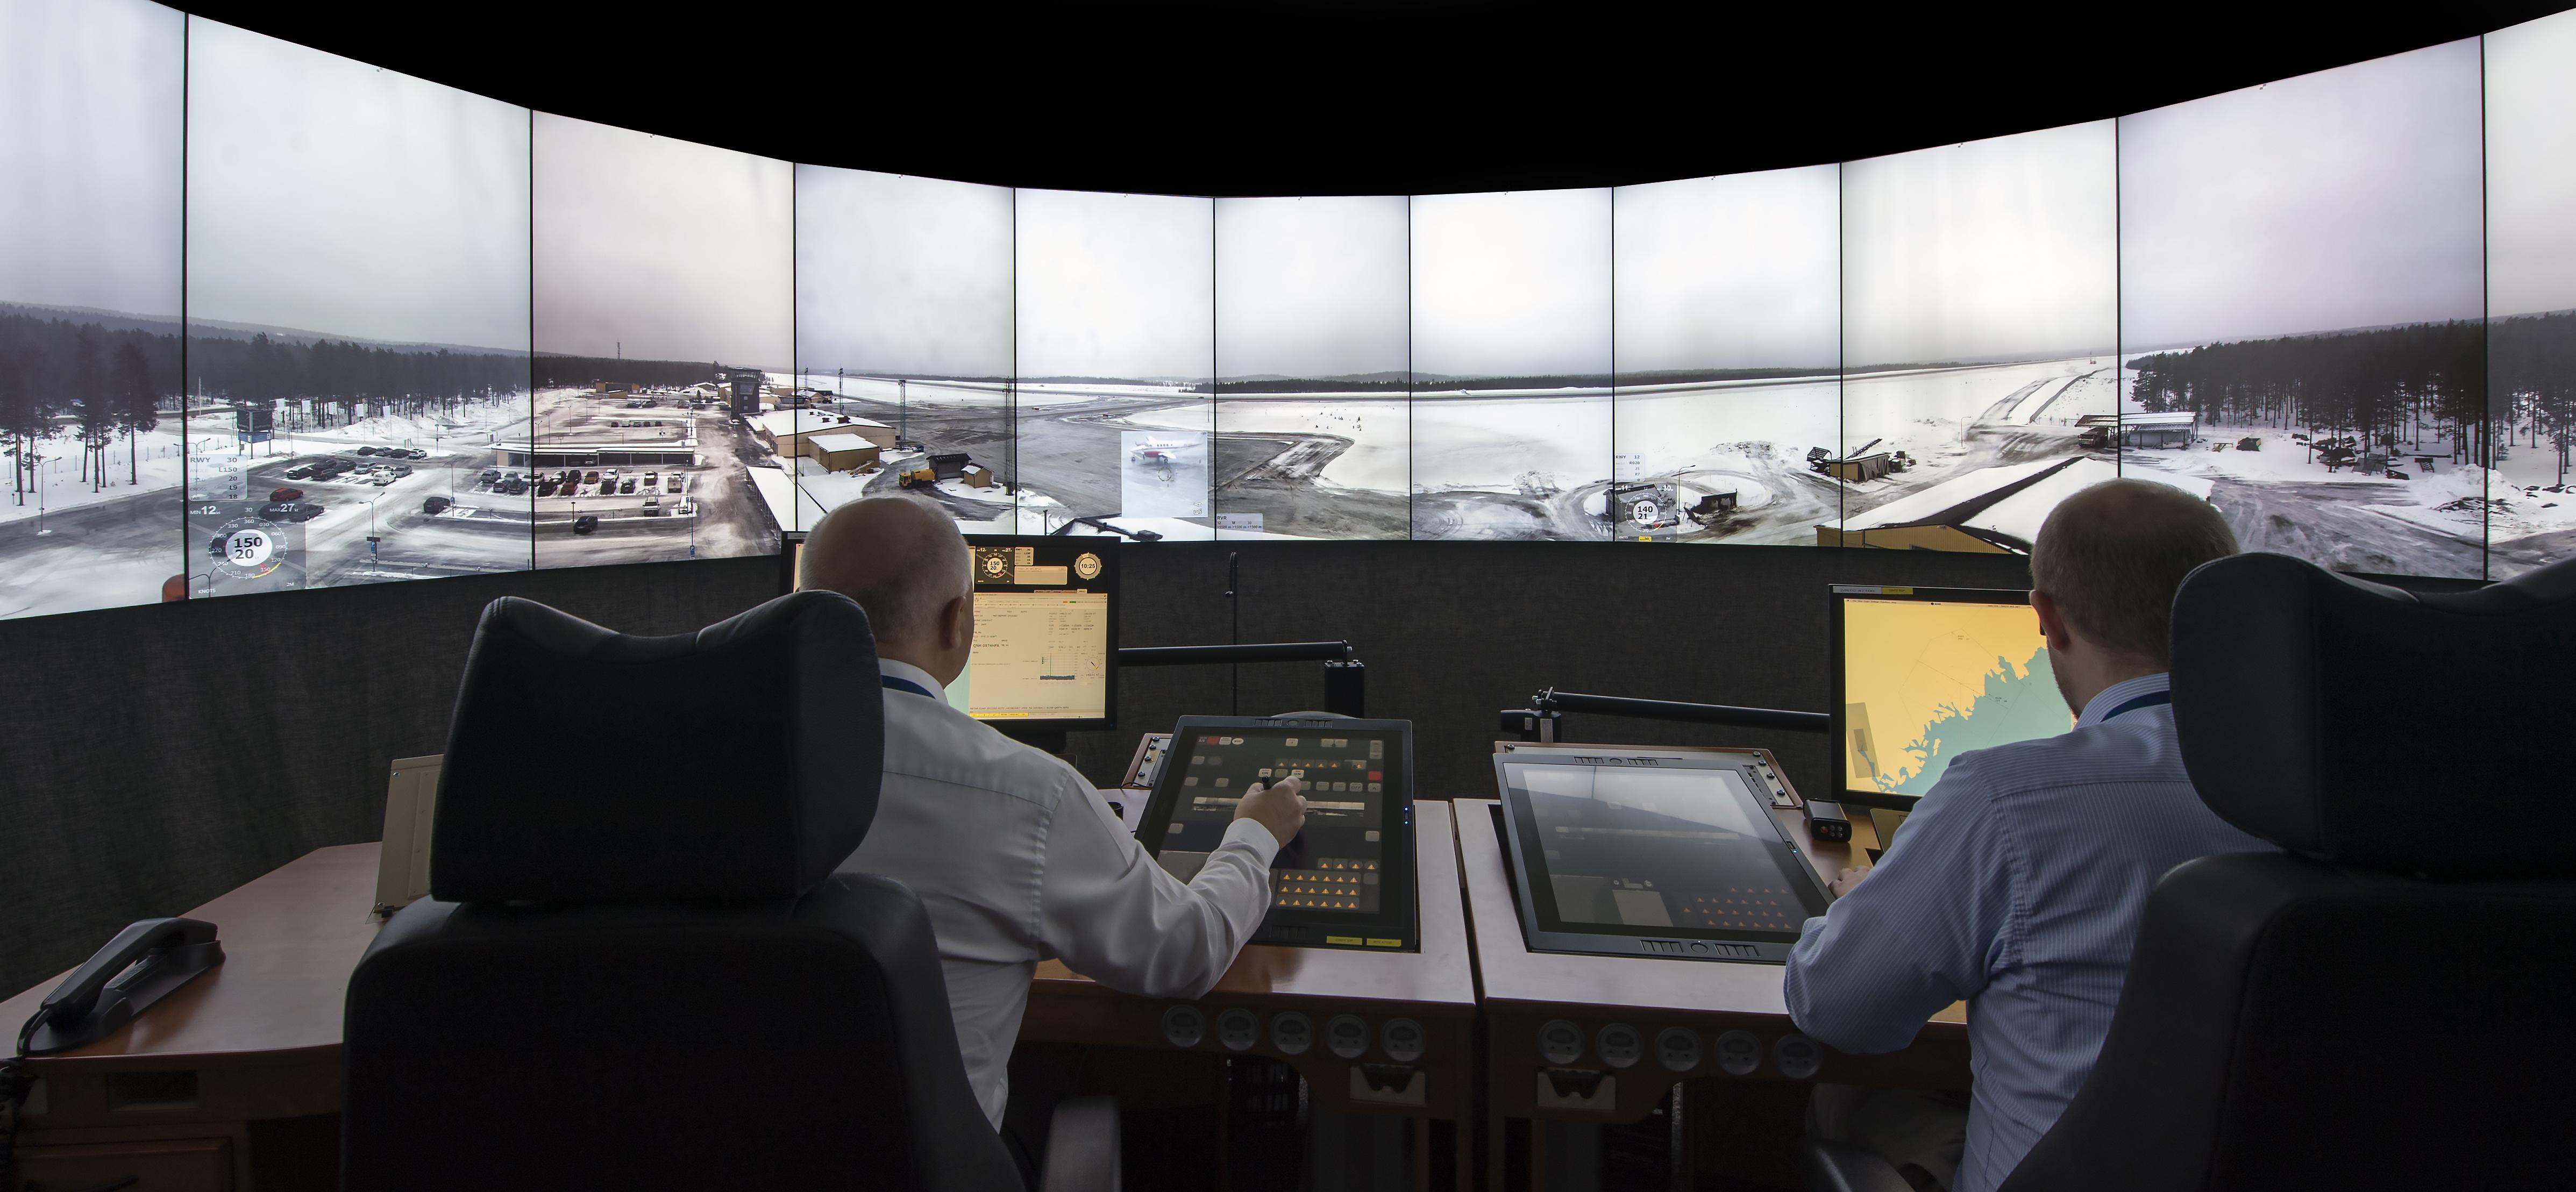 Saab Digital Tower Demonstrator Ordered by Royal Air Force